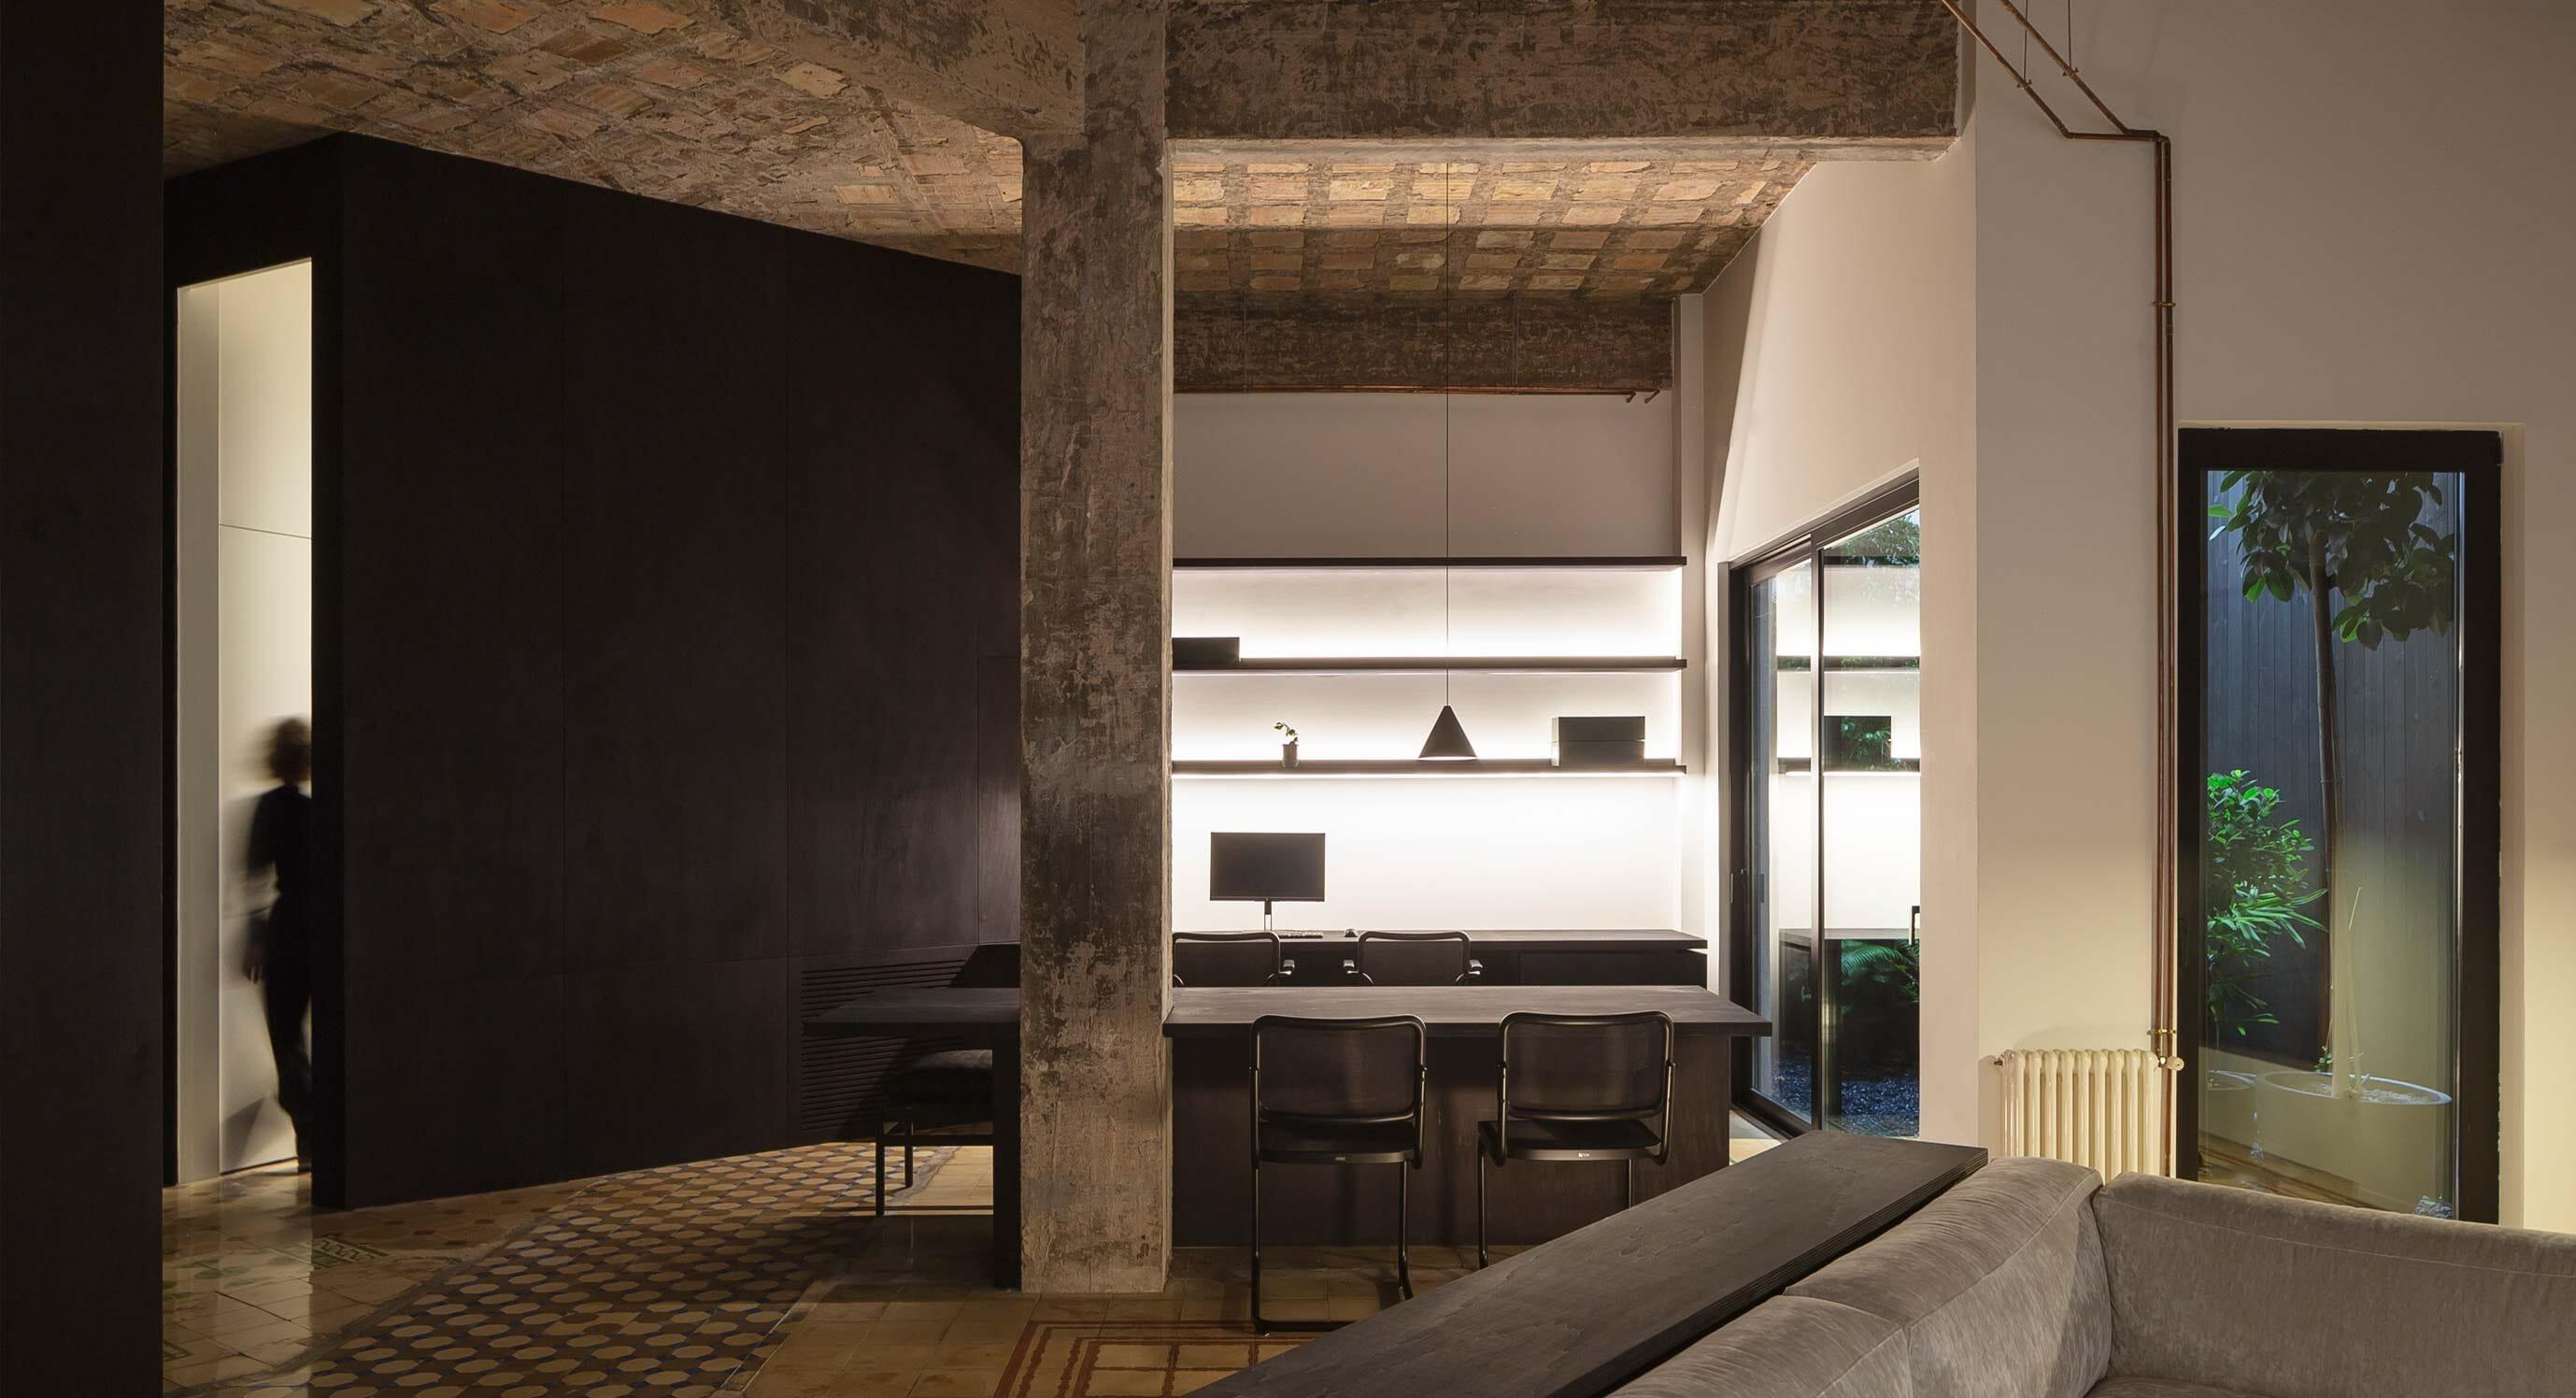 Francesc Rifé Studio's R Apartment Melds Old And New Valencia